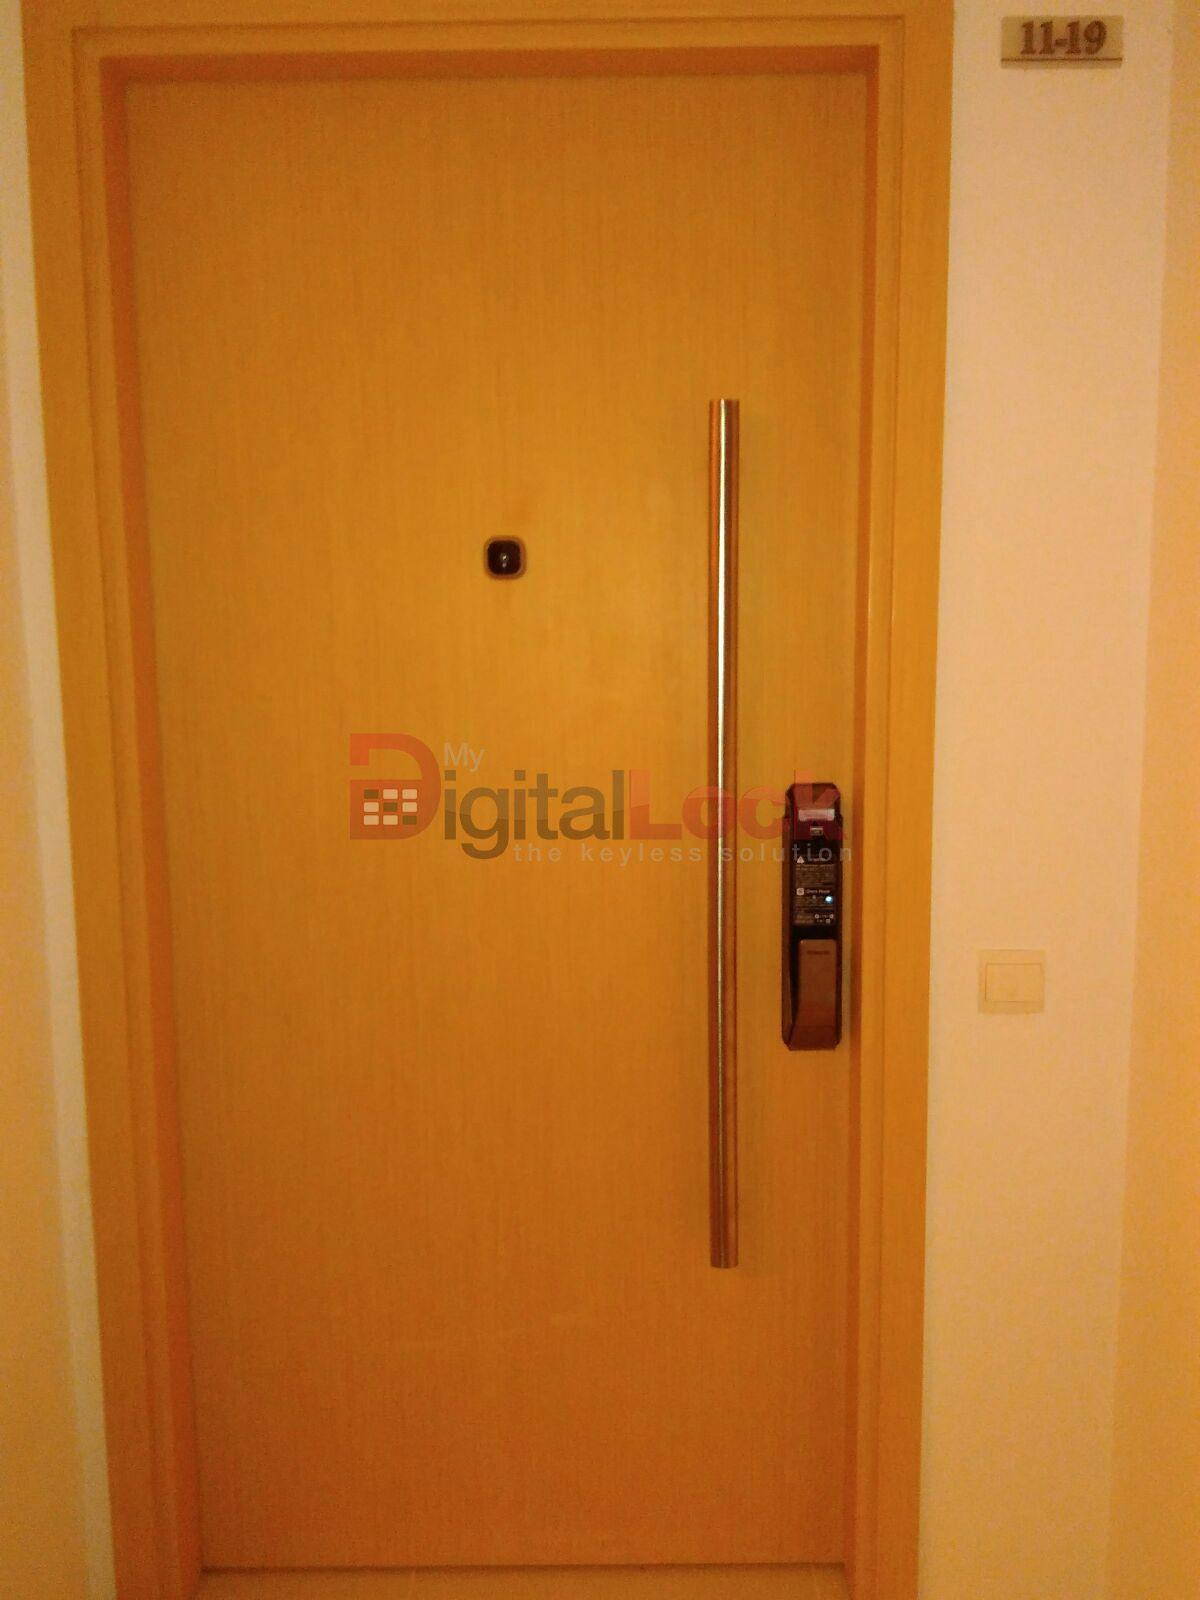 My Digital Lock Specialise In Gateman Keywe Smart Home Epic And Samsung Digital Lock For Hdb Fire Rated Main Door And Gate Hdb Laminate Bedroom Door Pvc Toi Digital Lock Locker